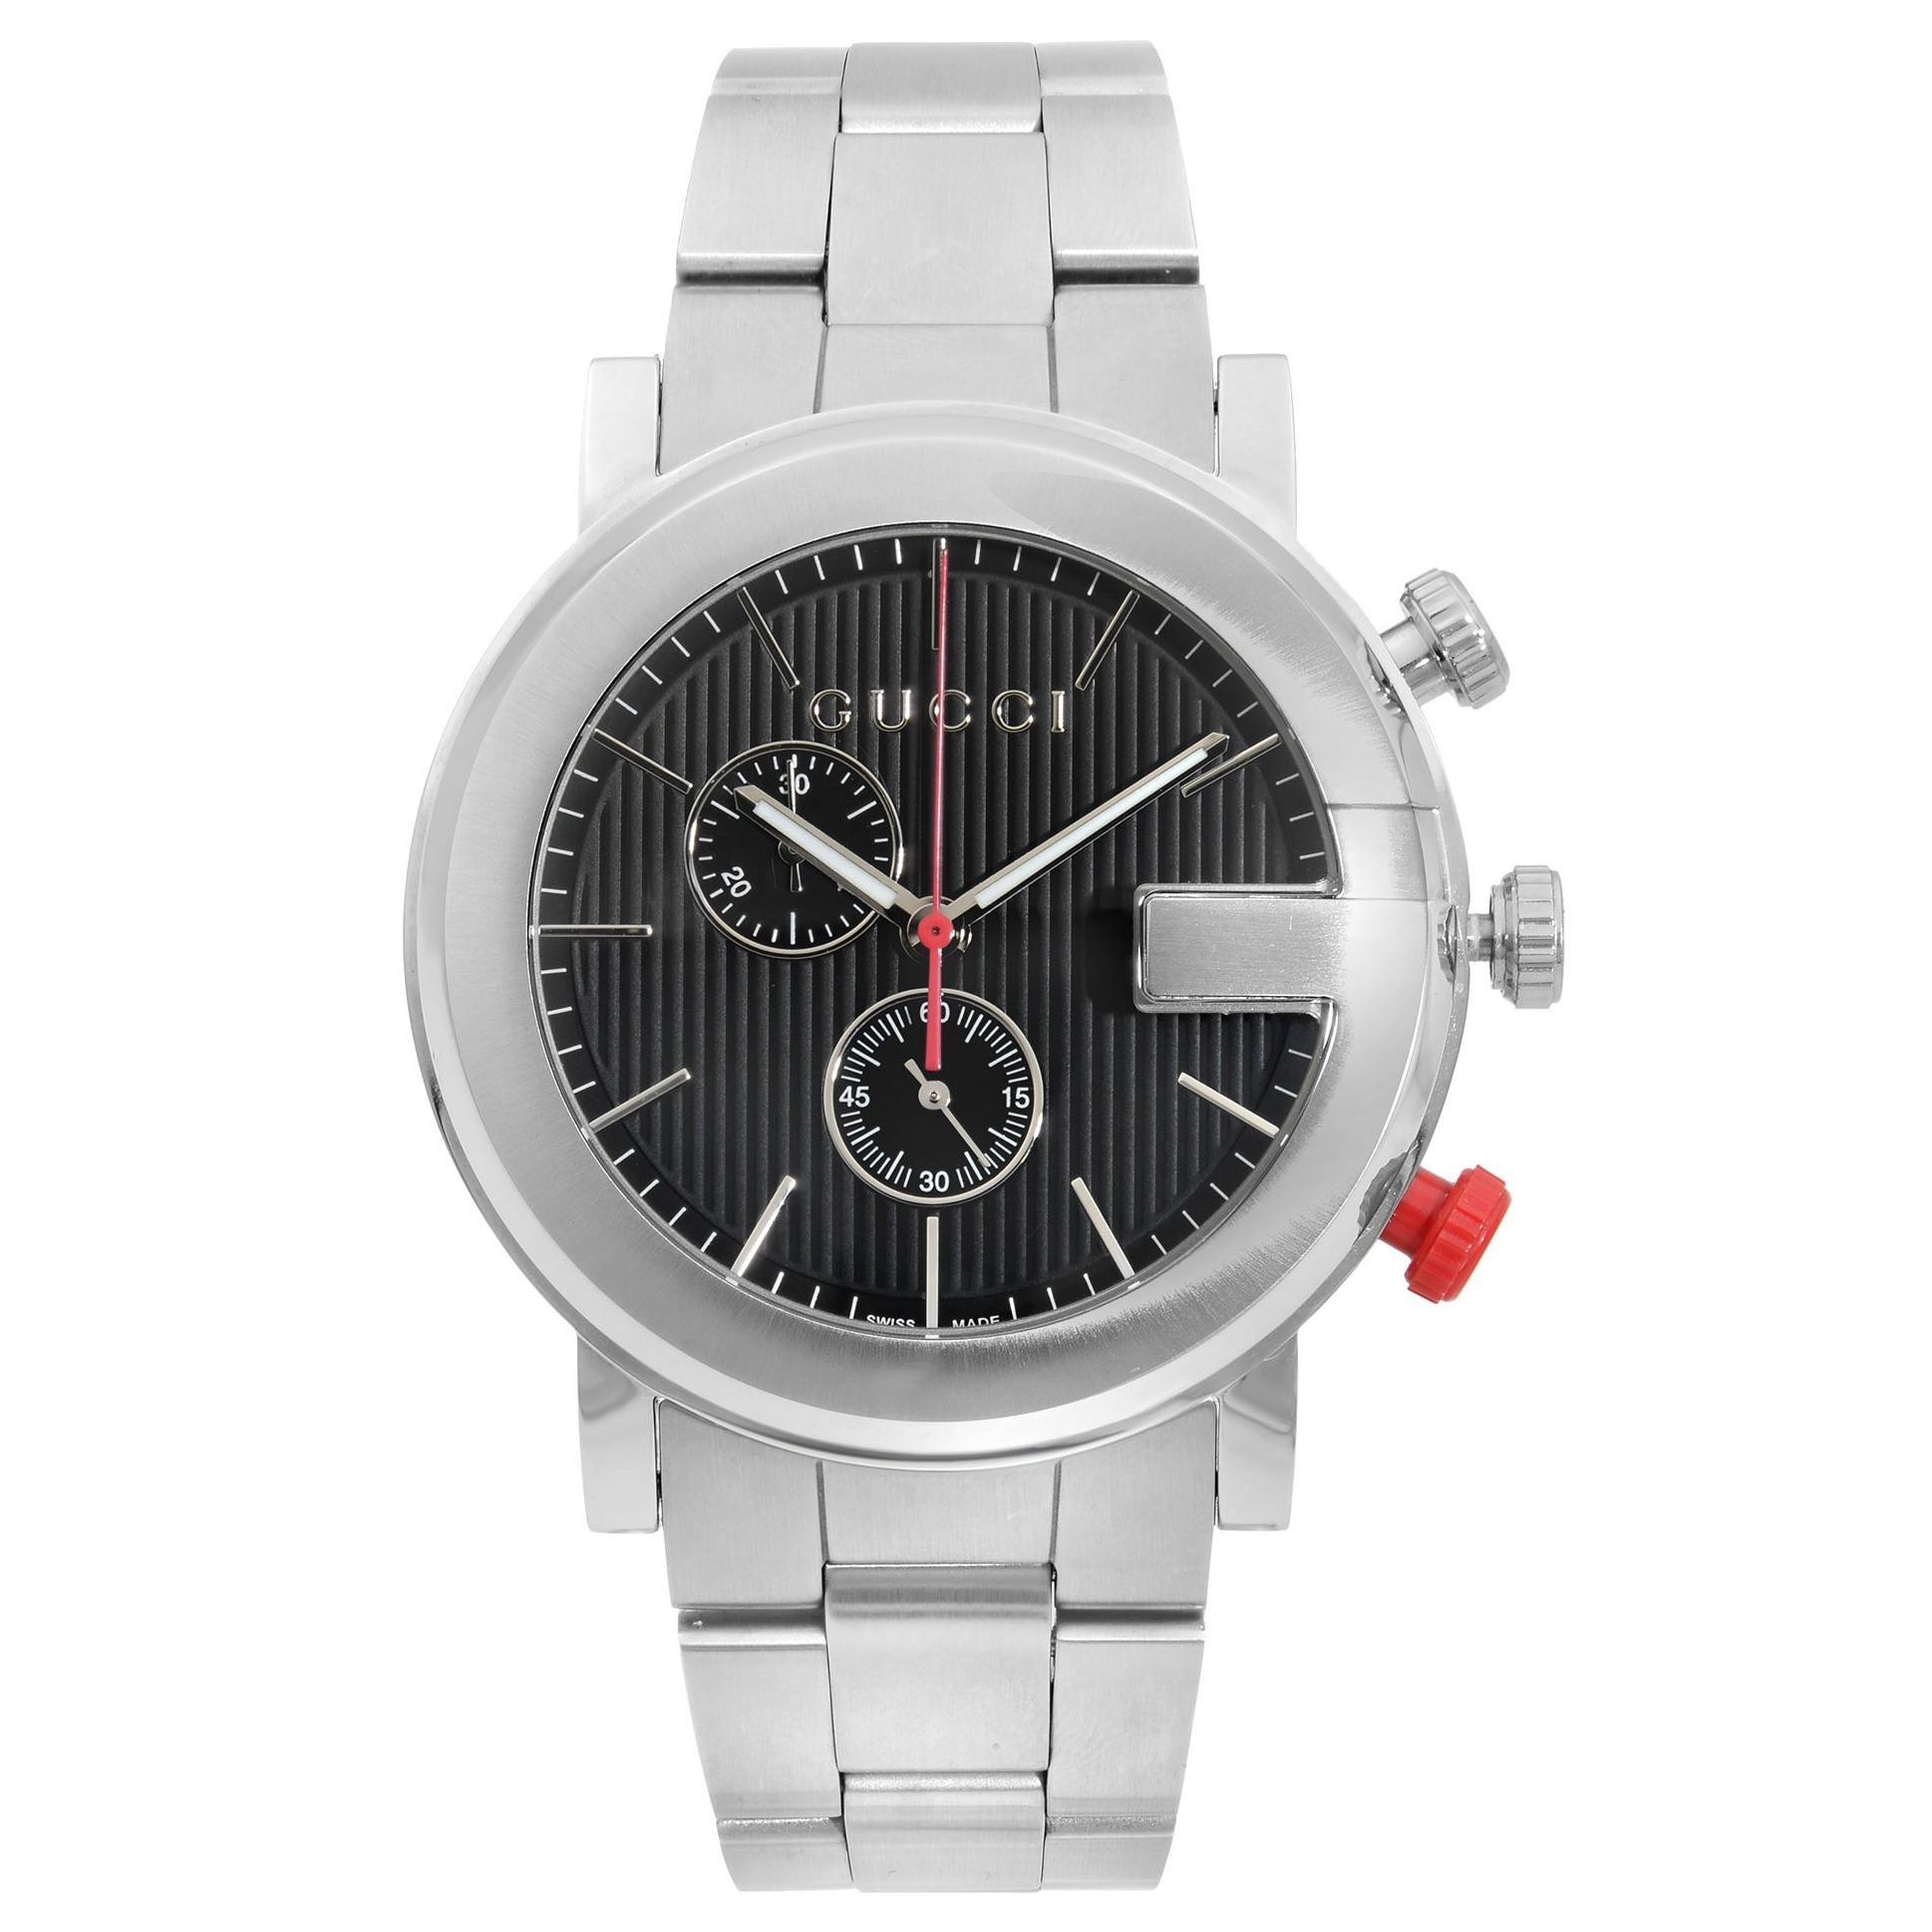 Gucci G Stainless Steel Chronograph Black Dial Quartz Men's Watch YA101361